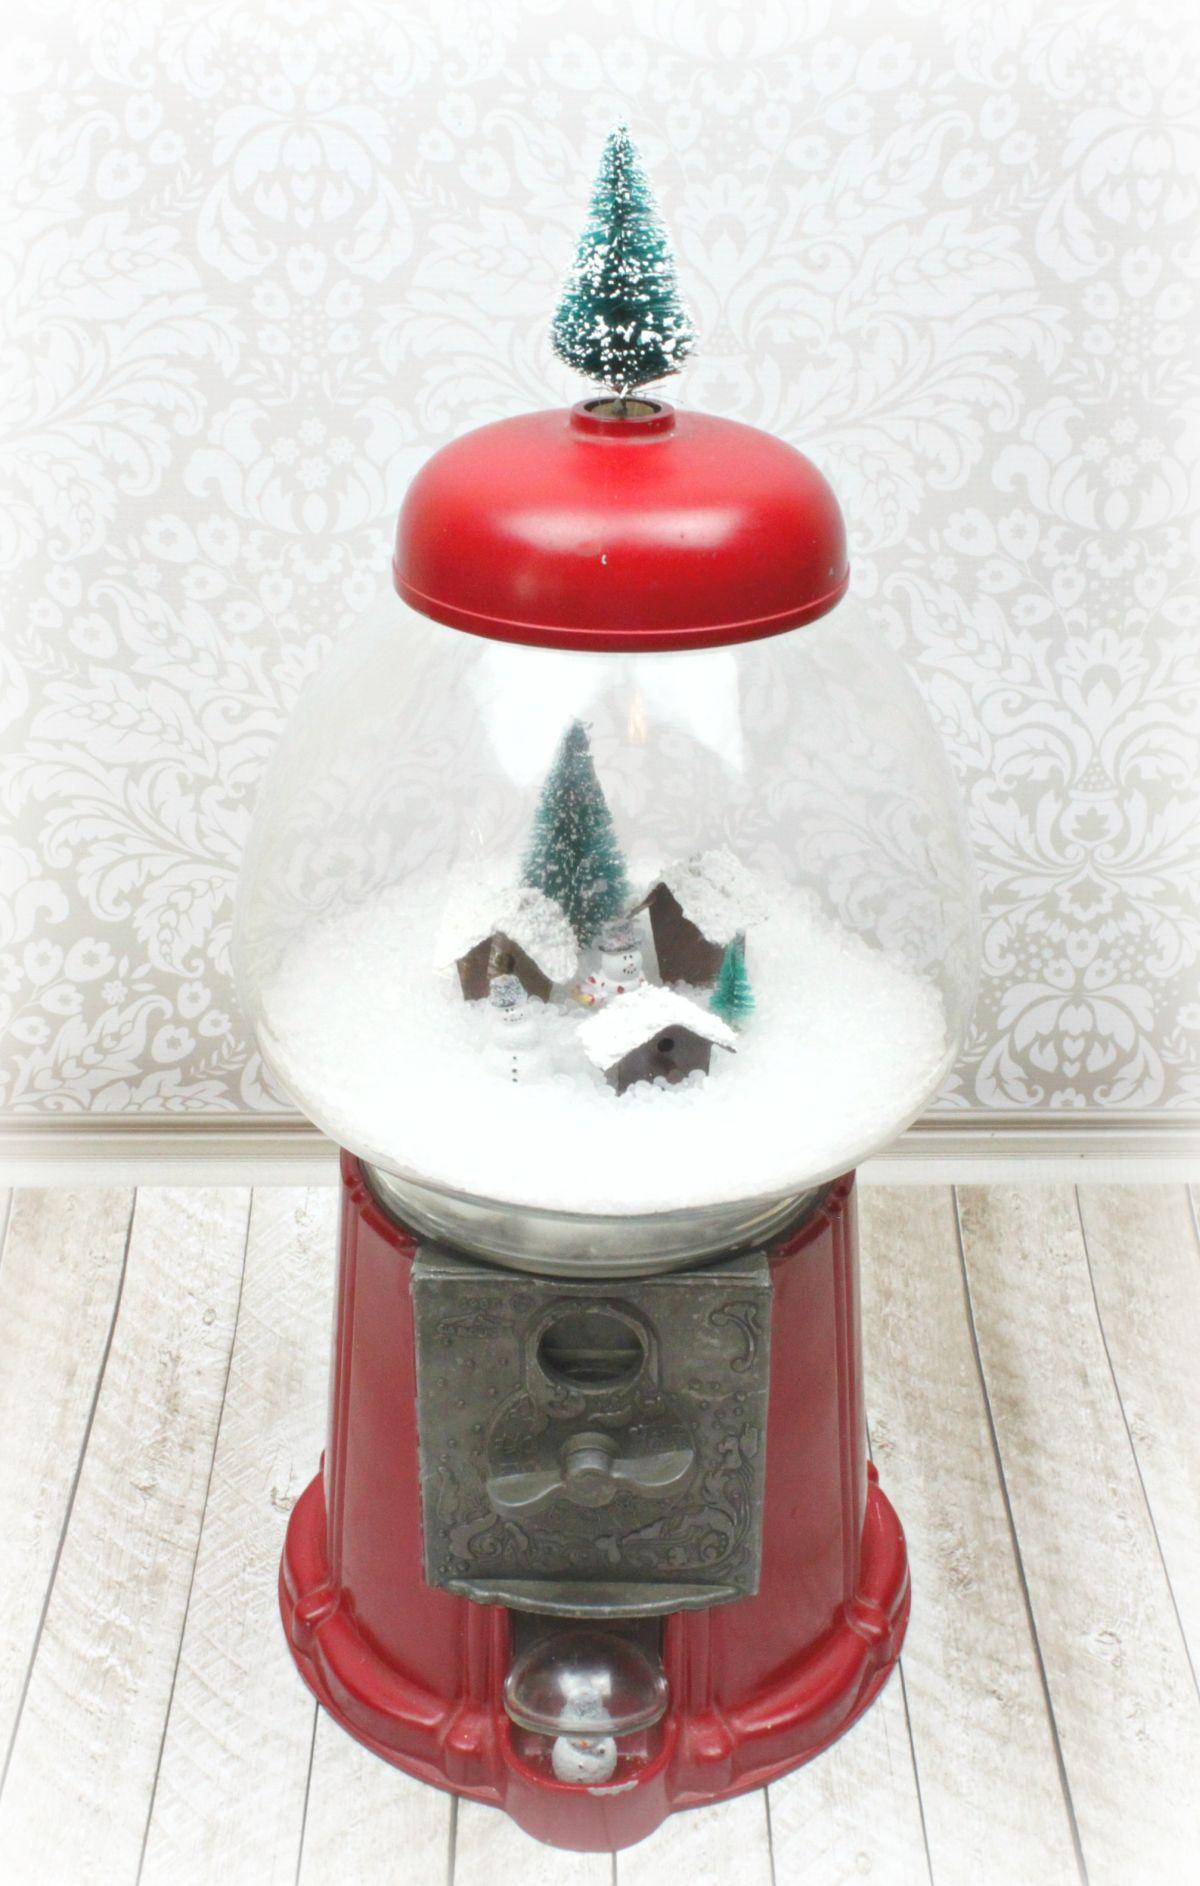 Make Gumball Machine Snow Globe Decor - snowy scene